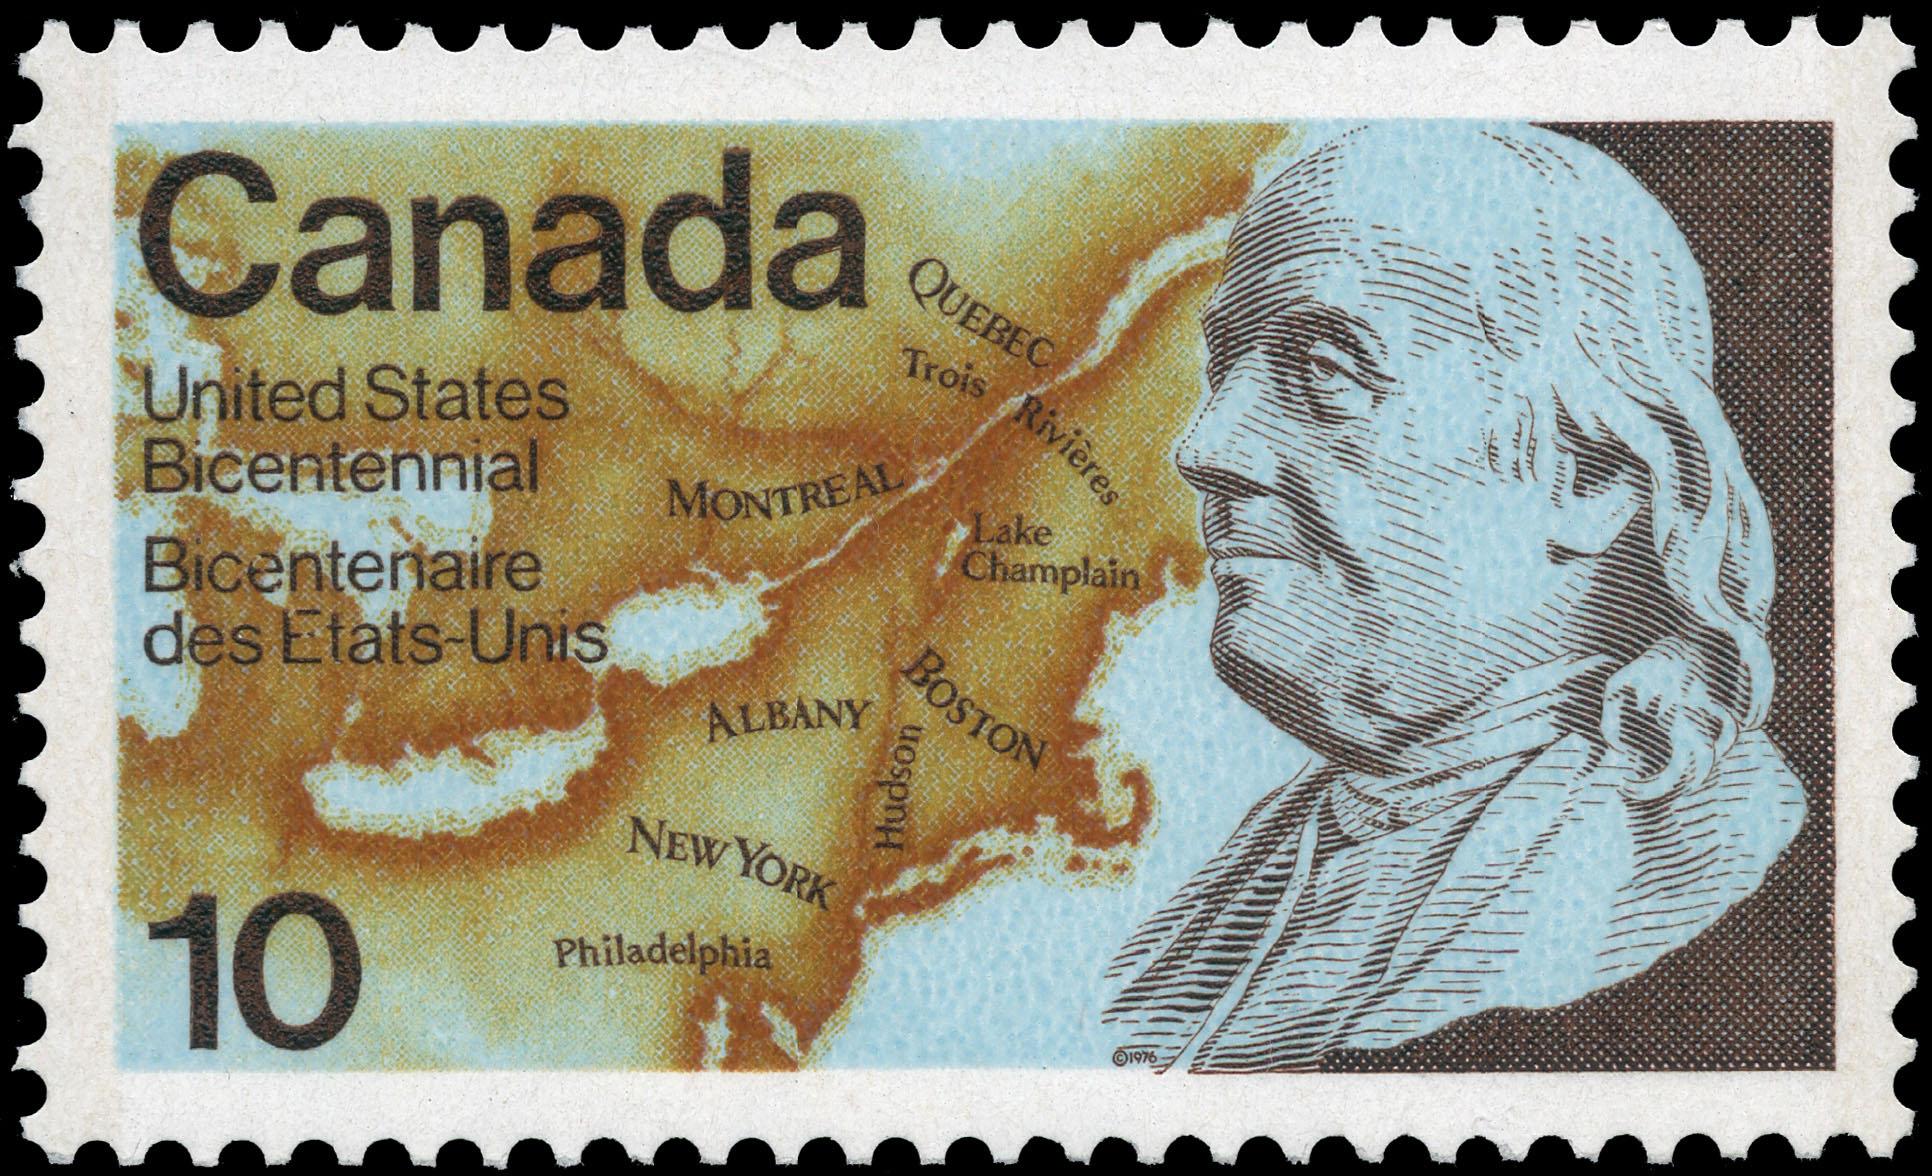 United States Bicentennial, Benjamin Franklin Canada Postage Stamp